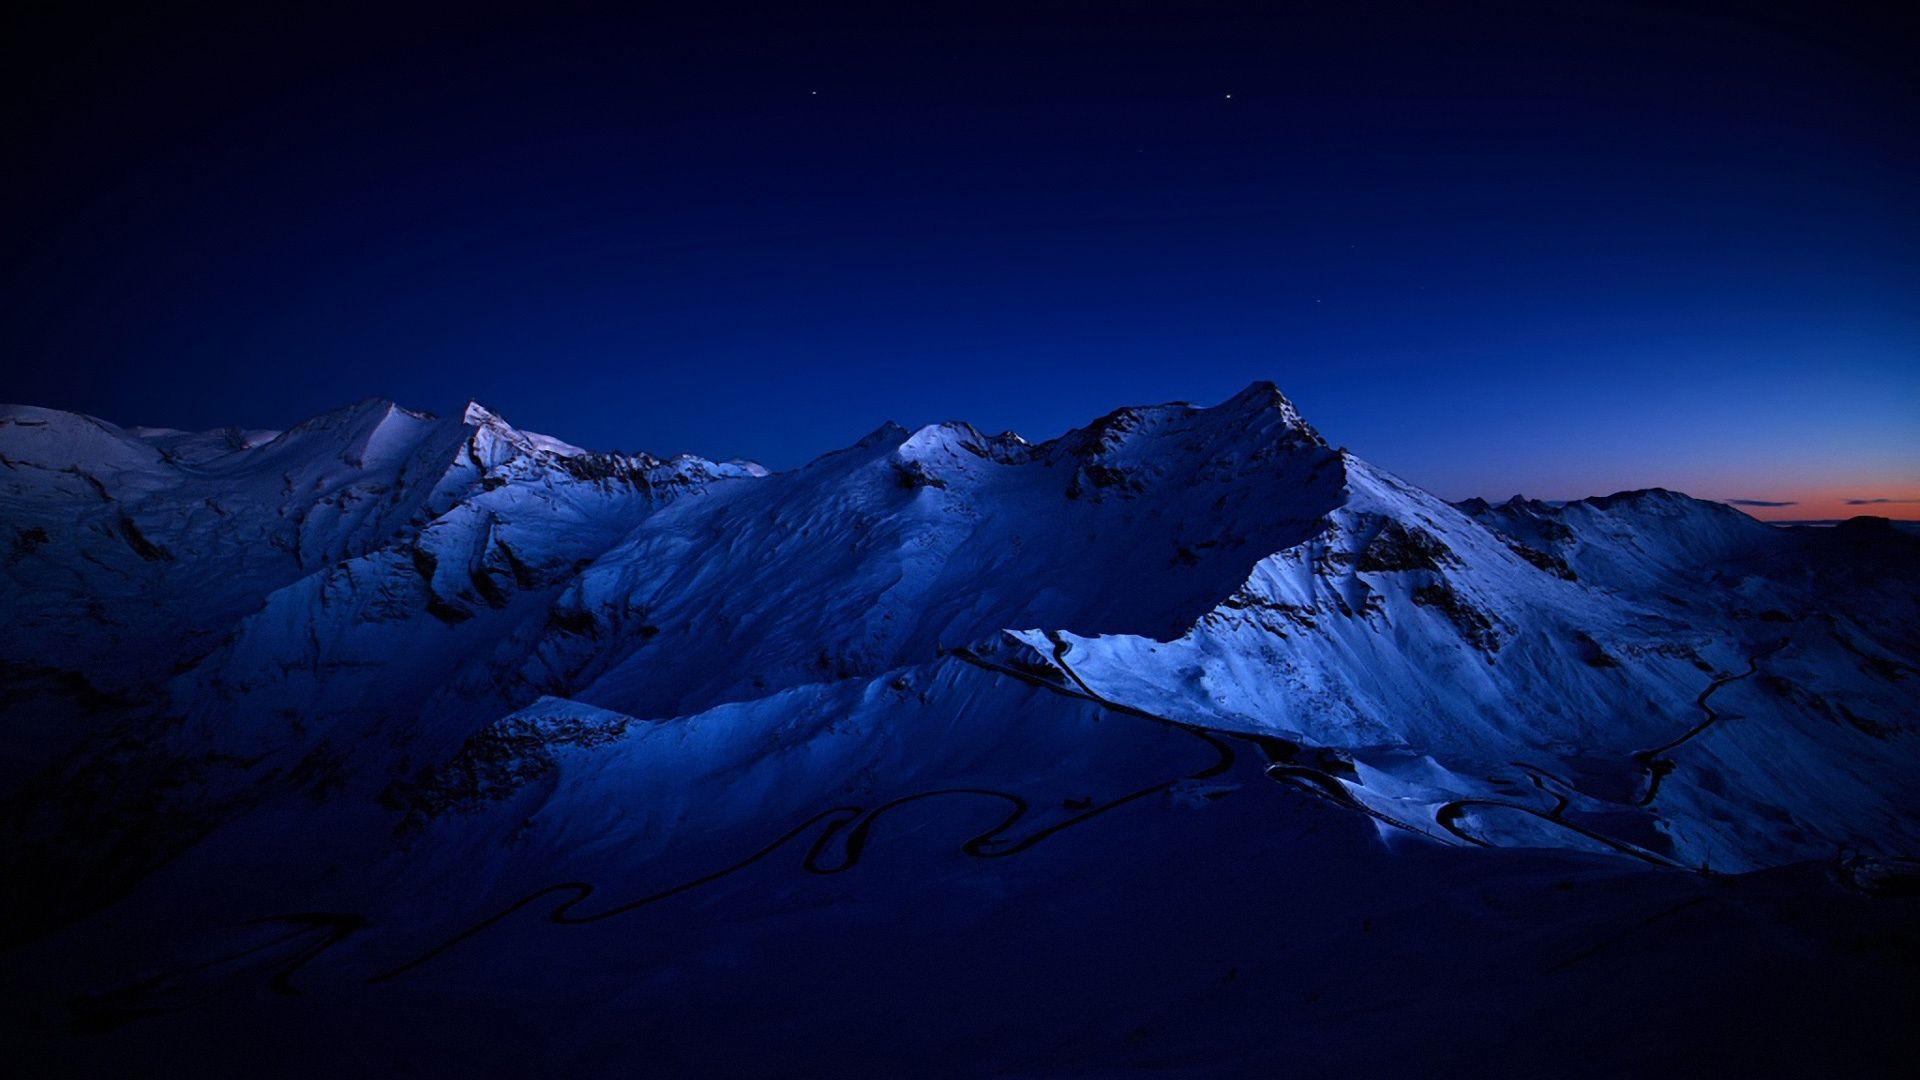 Night Mountain Wallpapers Free Sdeerwallpaper Places